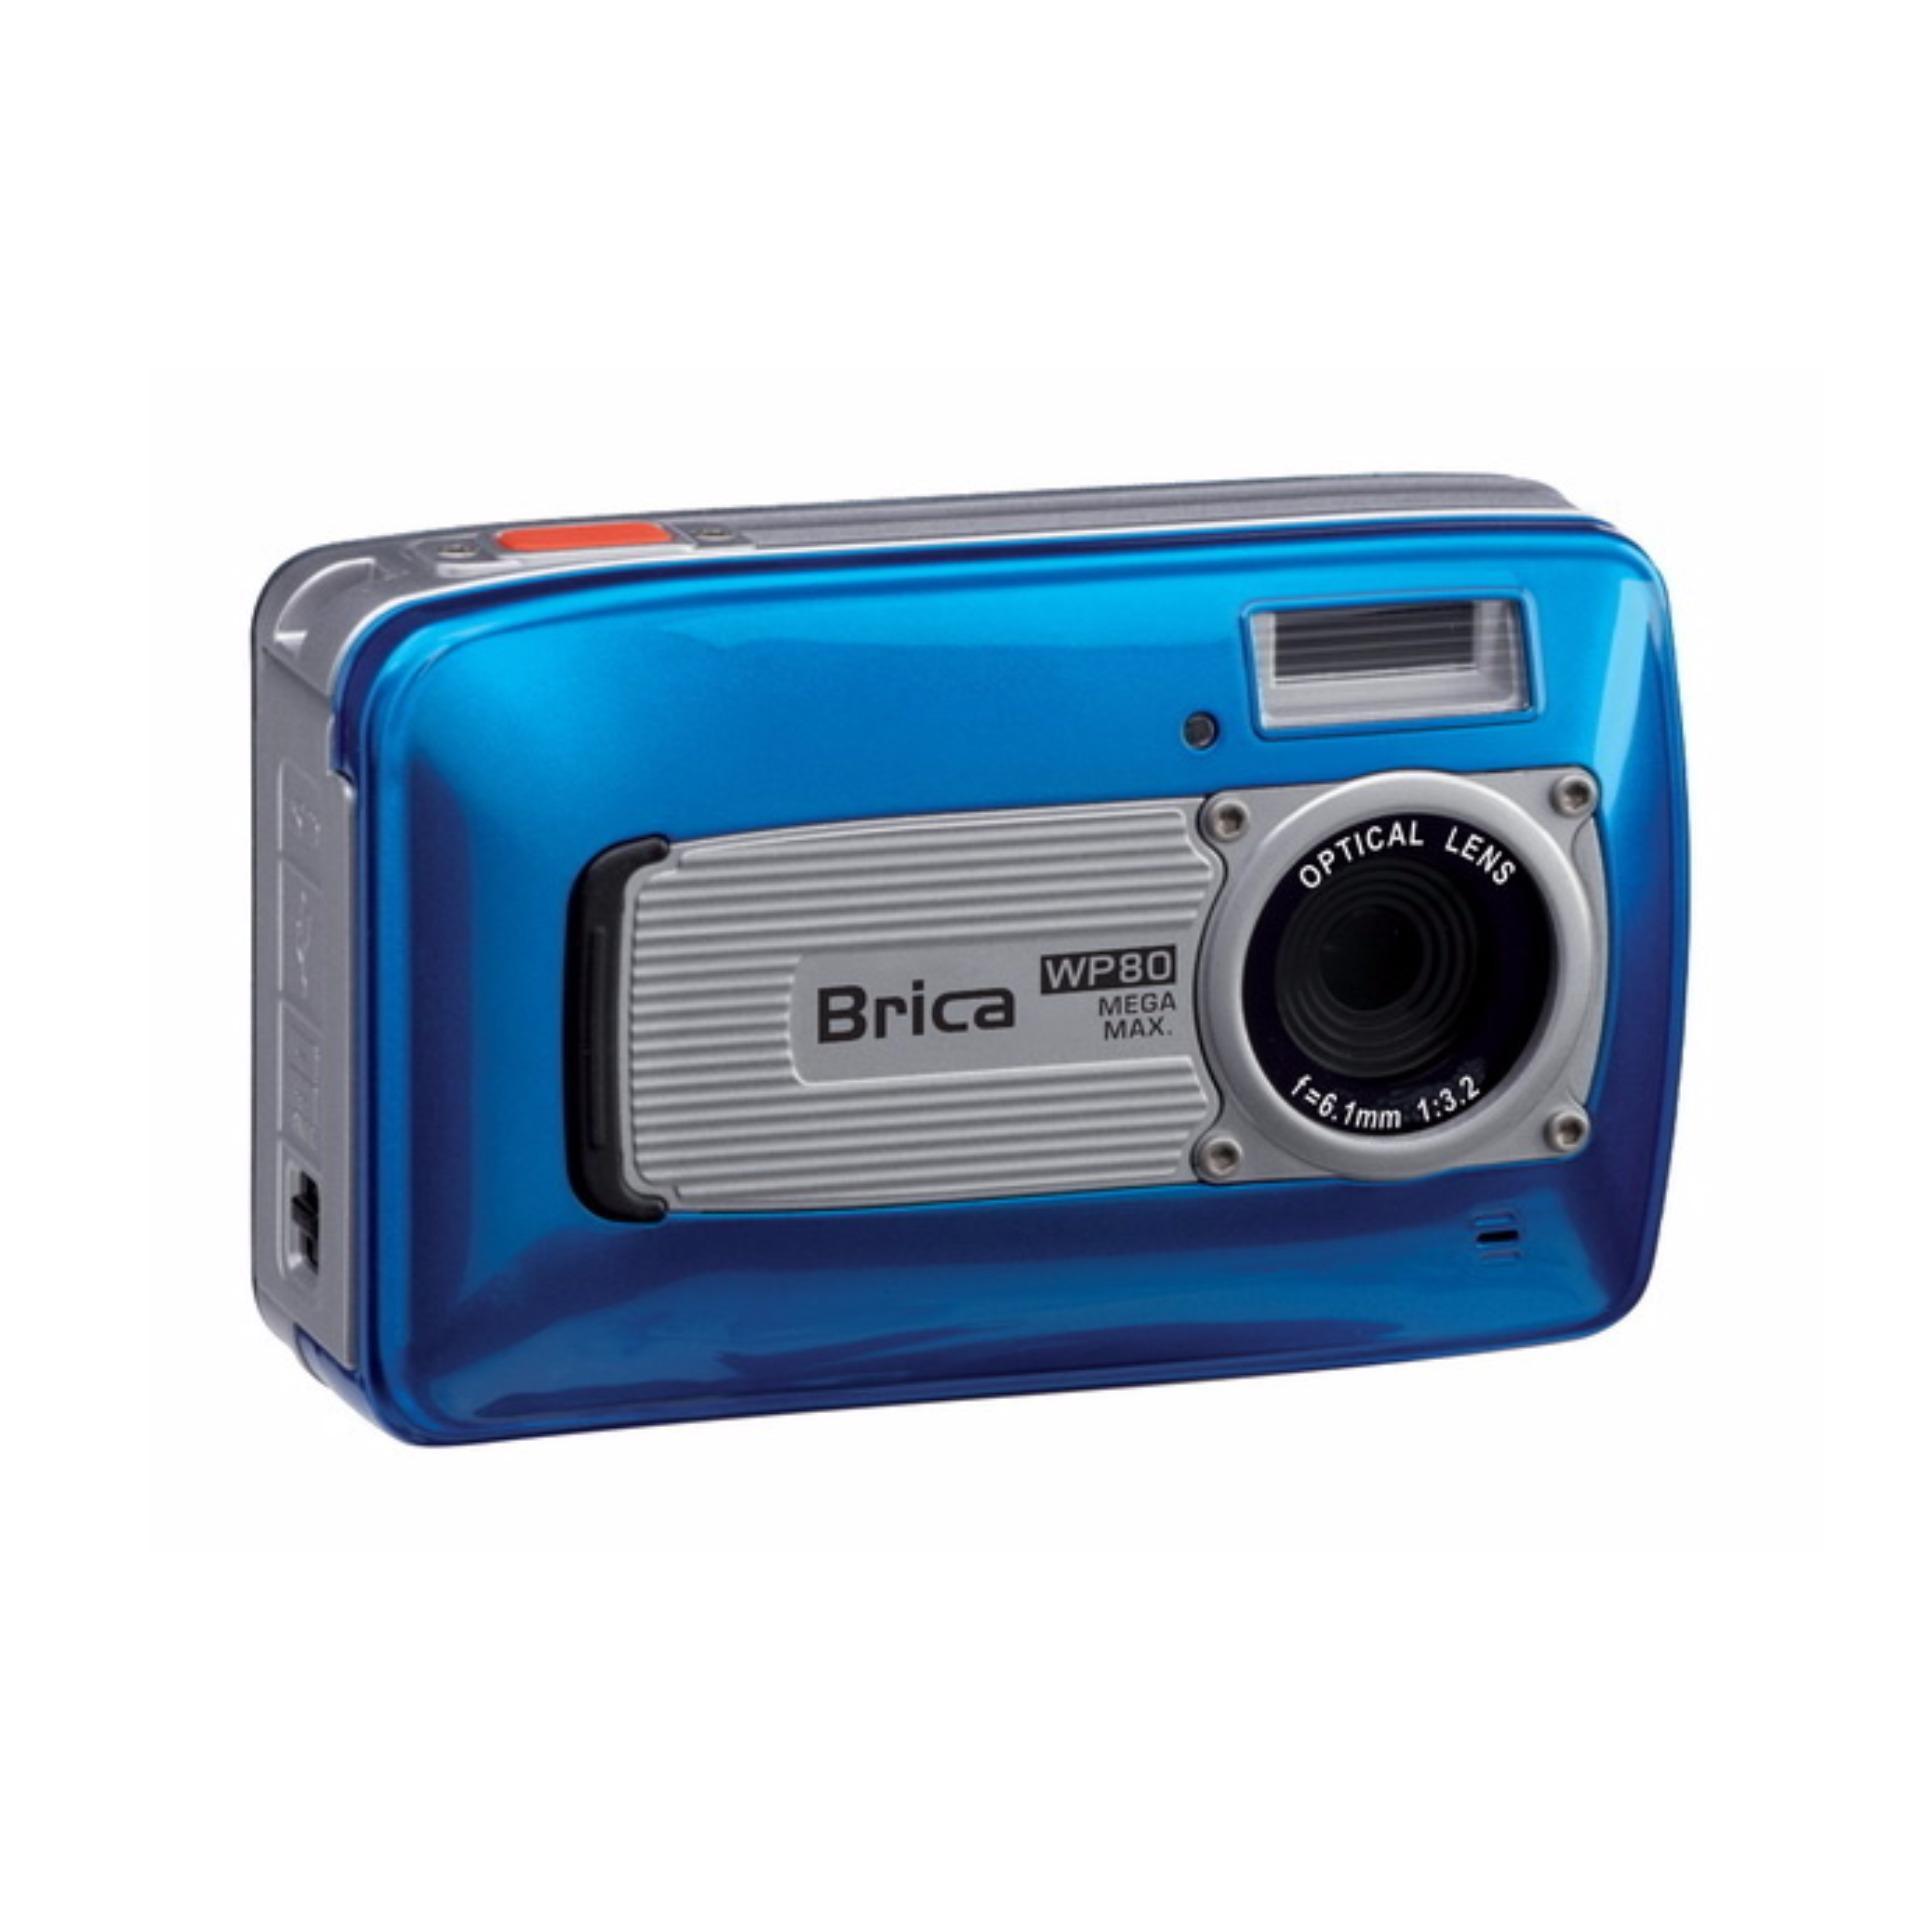 Authentic Brica Digital Camera WP80 / Underwater Sports Camera 5m Max Depth